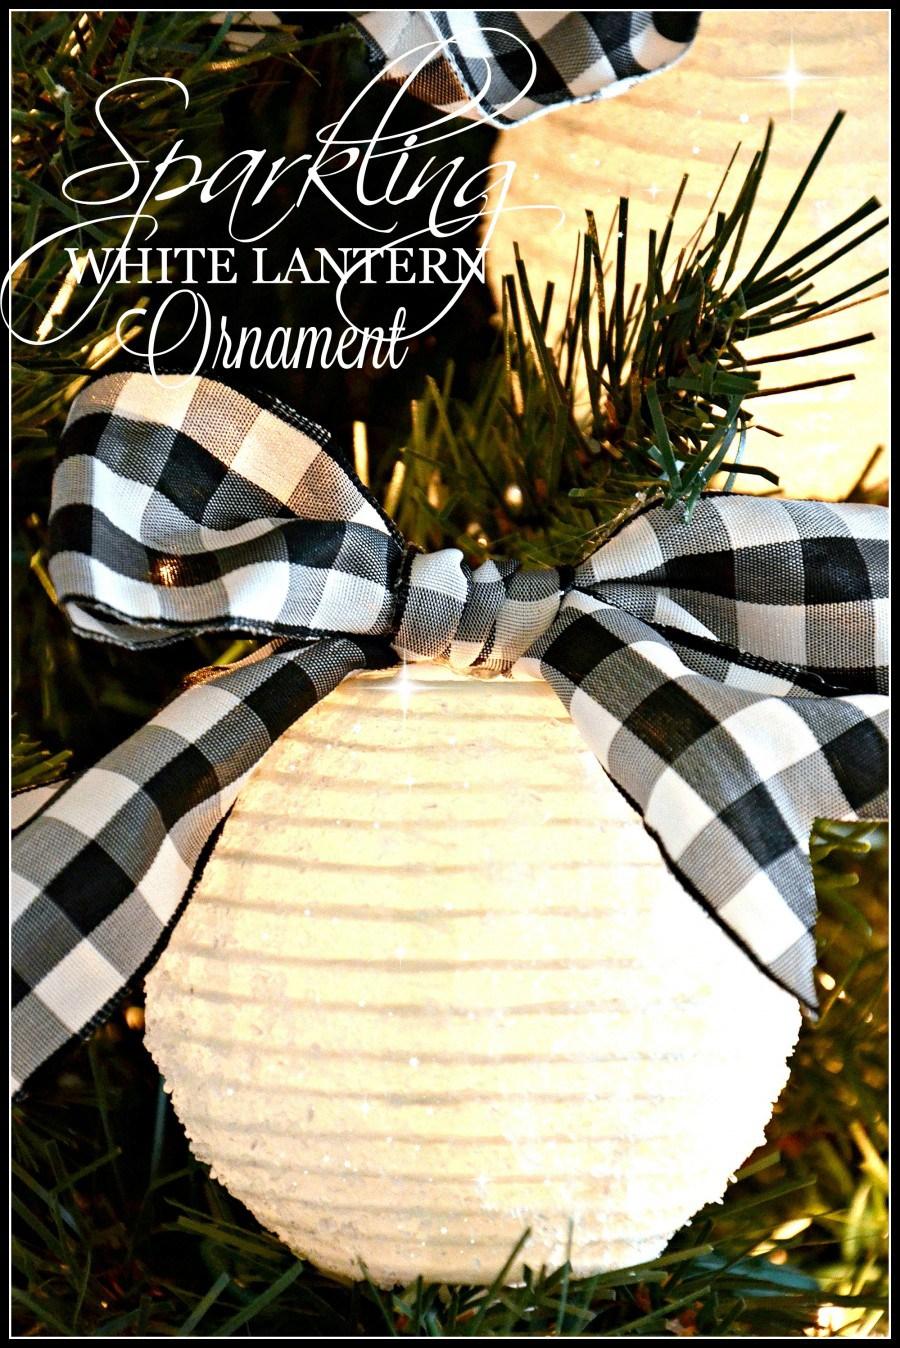 1-sparkling-white-lantern-ornament-stonegableblog-com_